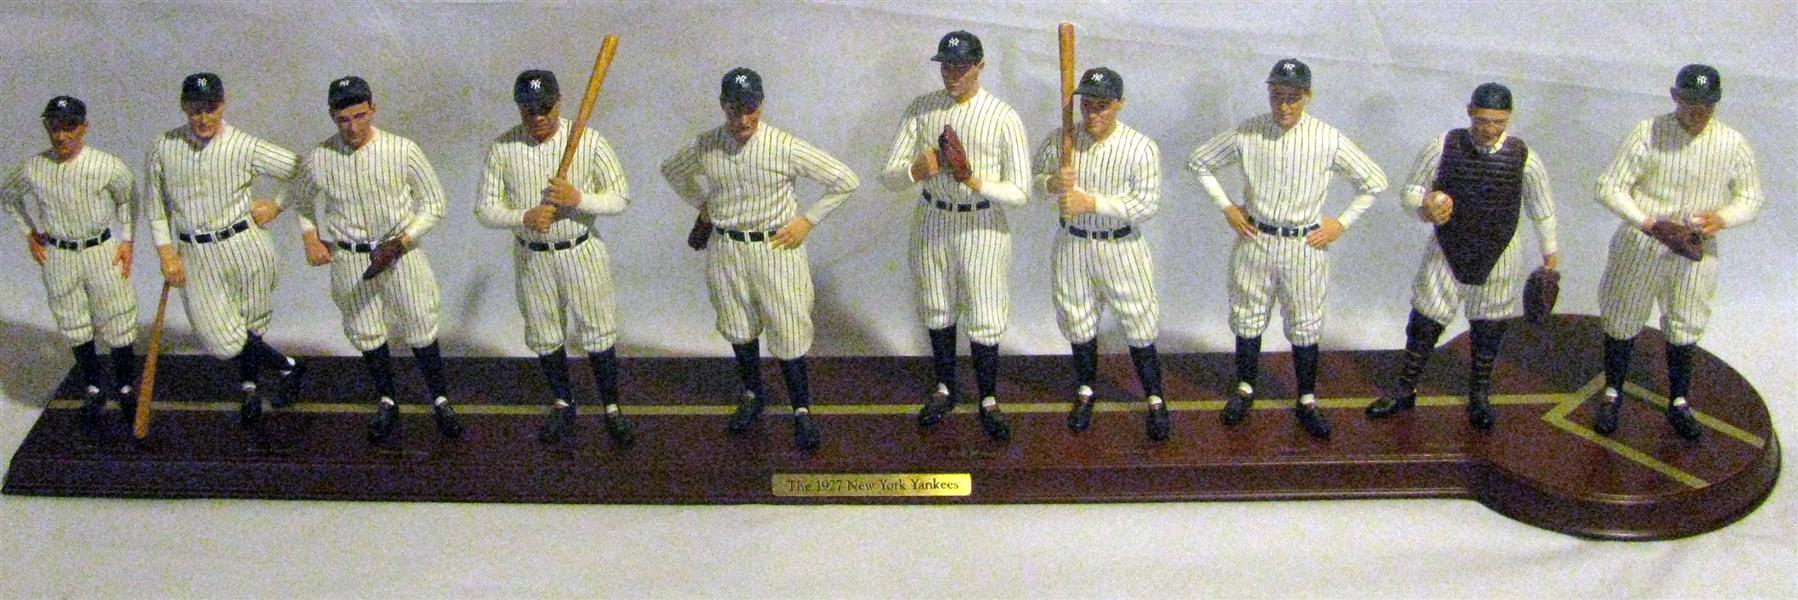 1927 new york yankees team photo